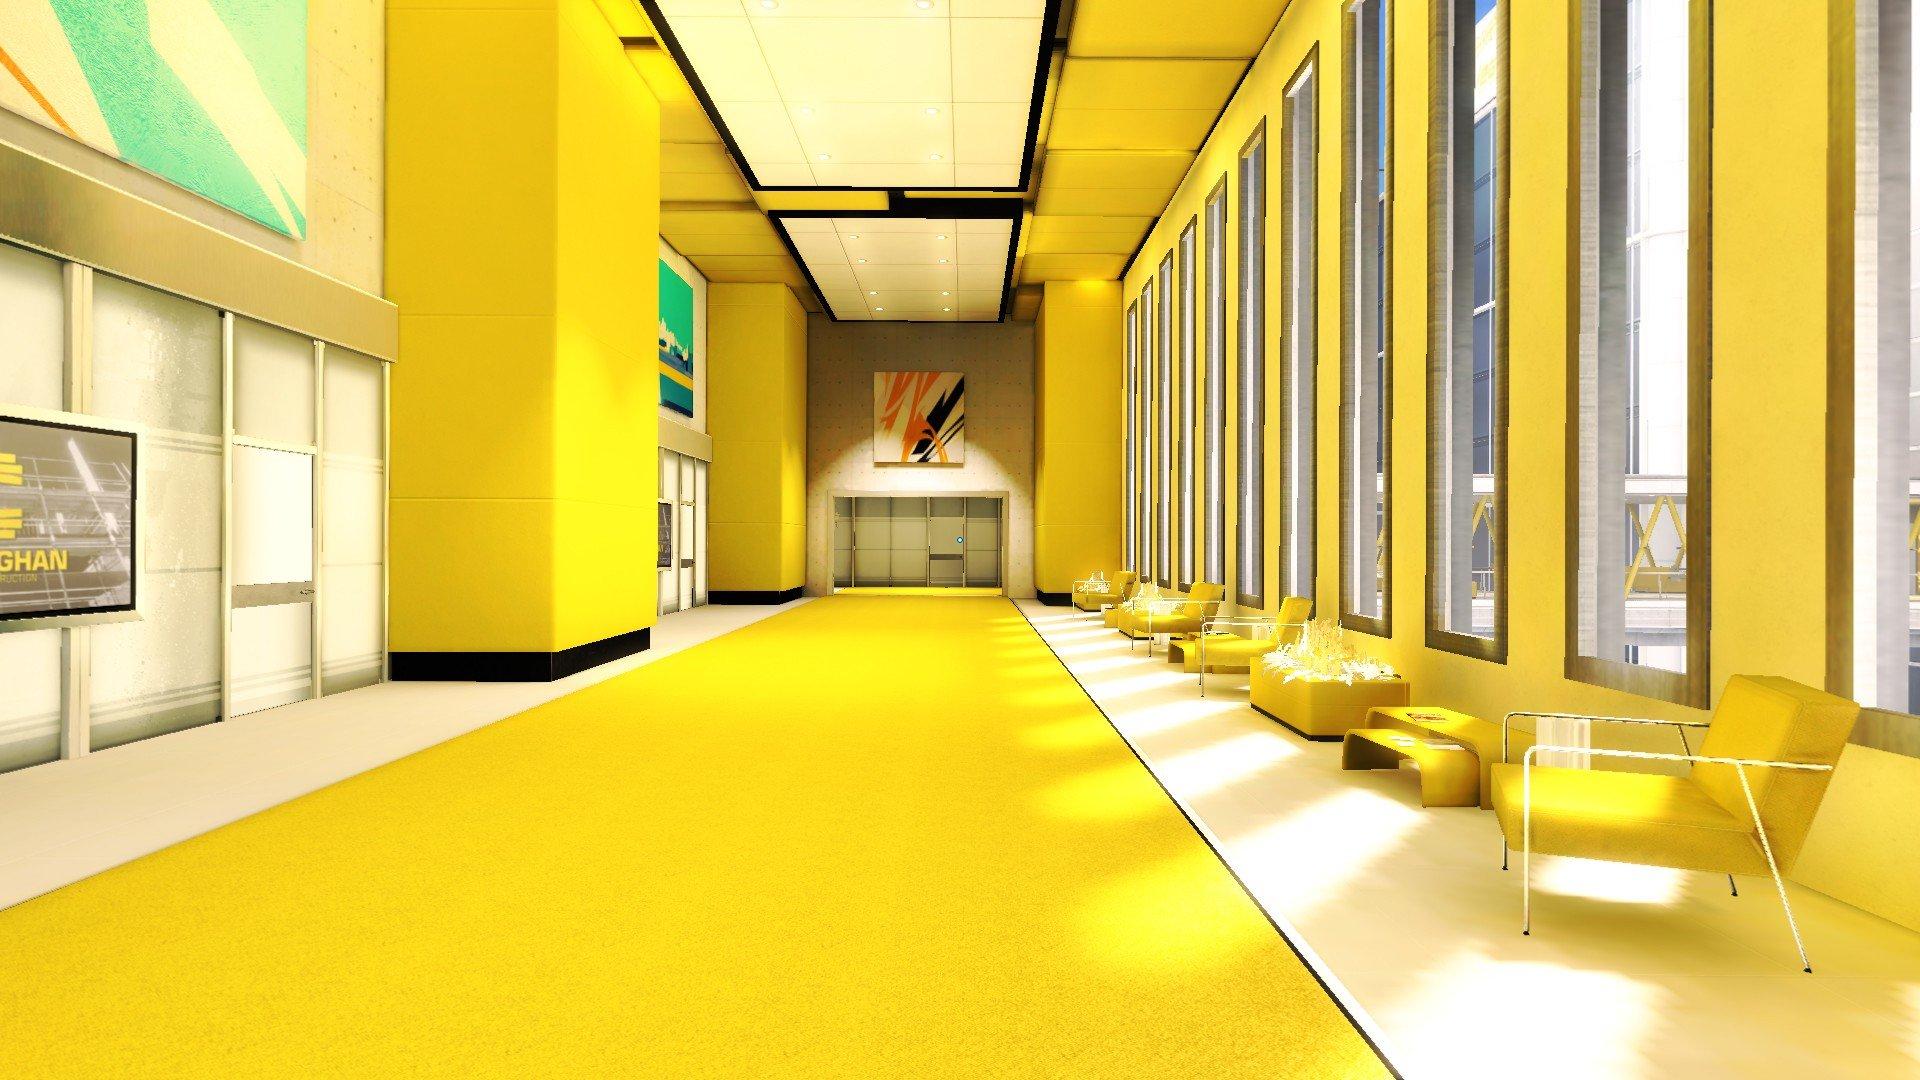 Interior design yellow mirrors edge screenshots hd - Wallpaper interior design pictures ...